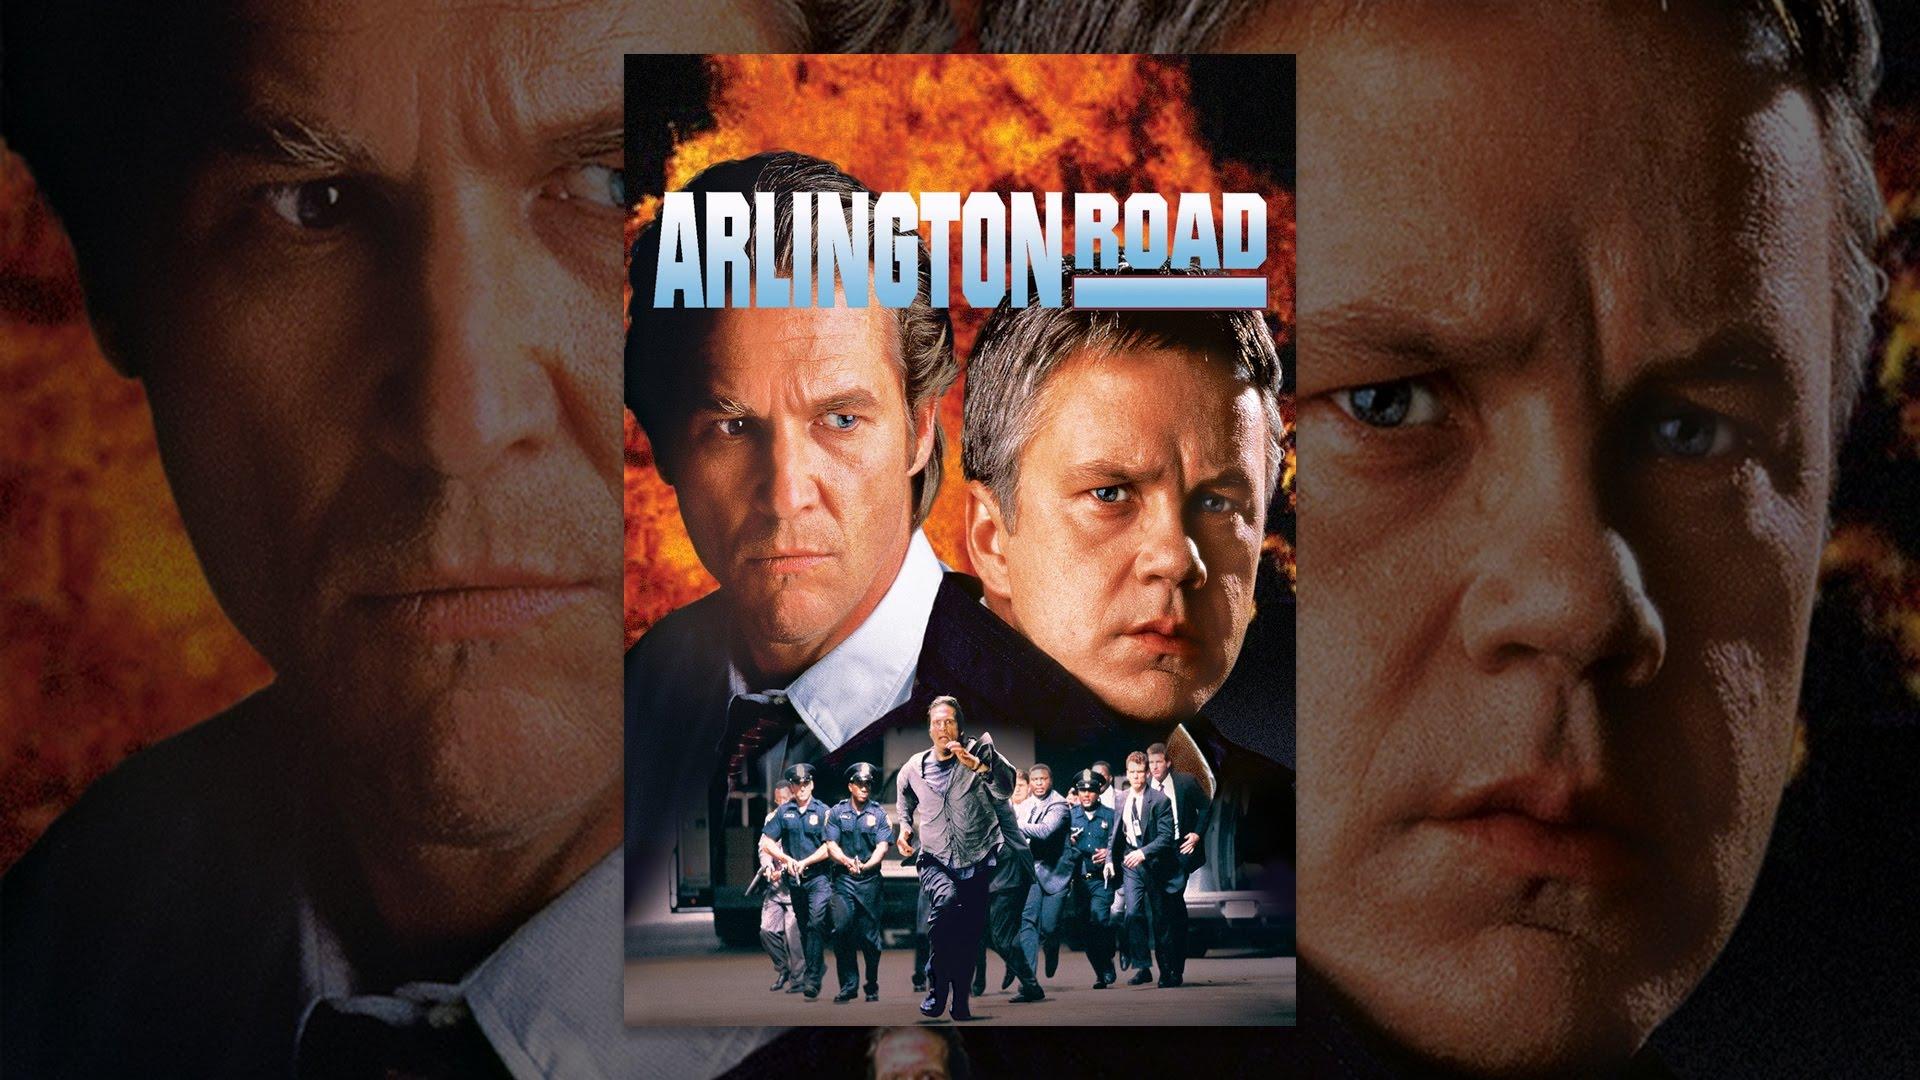 Arlington Road Arlington Road